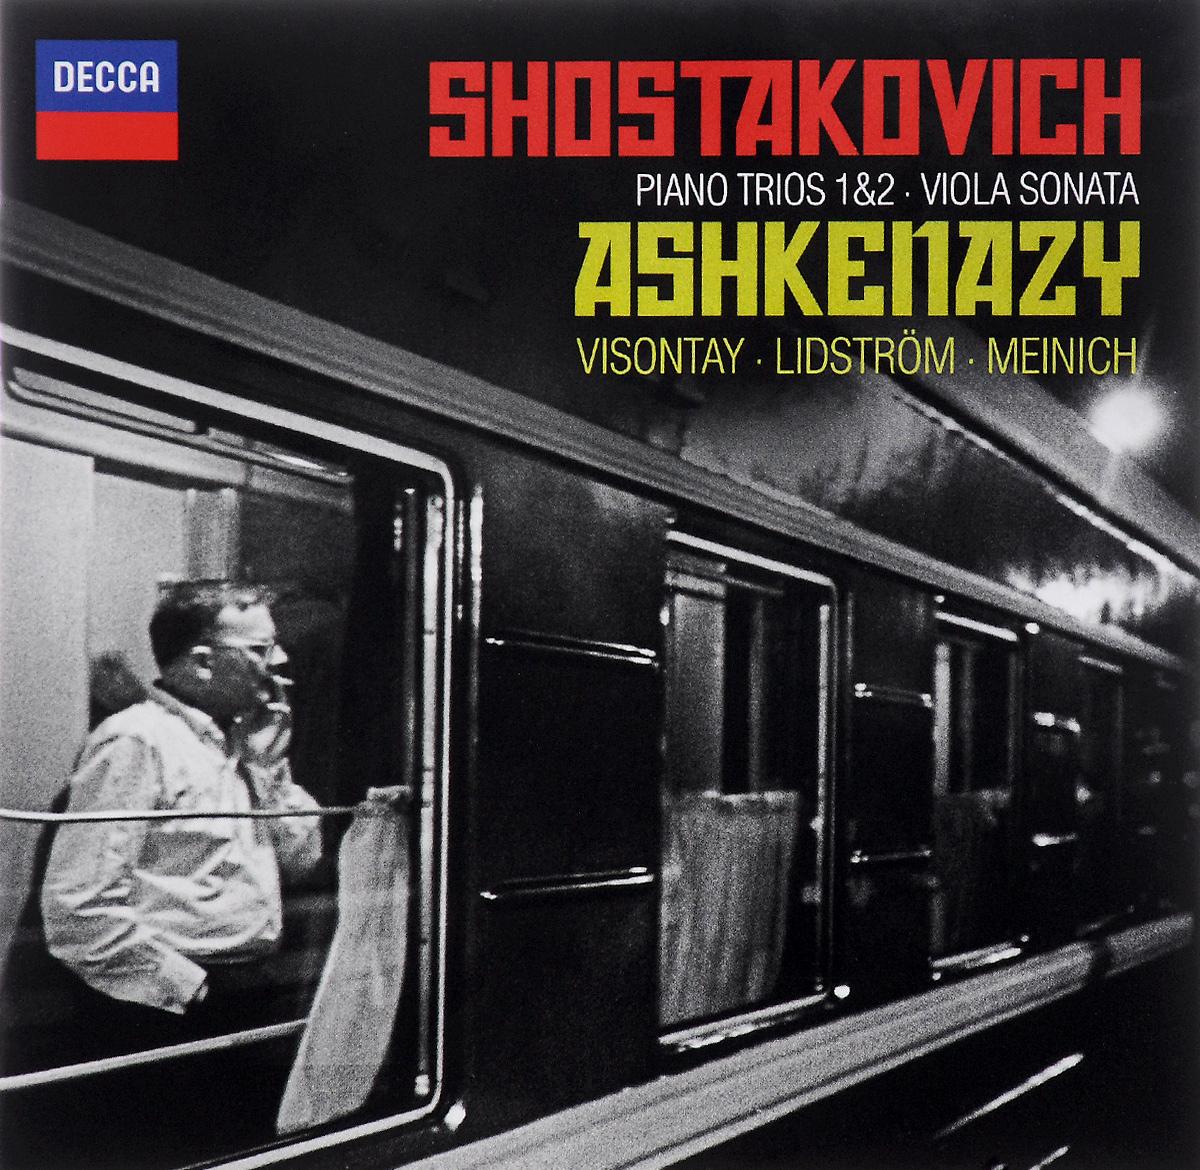 Shostakovich. Piano Trios 1 & 2 Viola Sonata